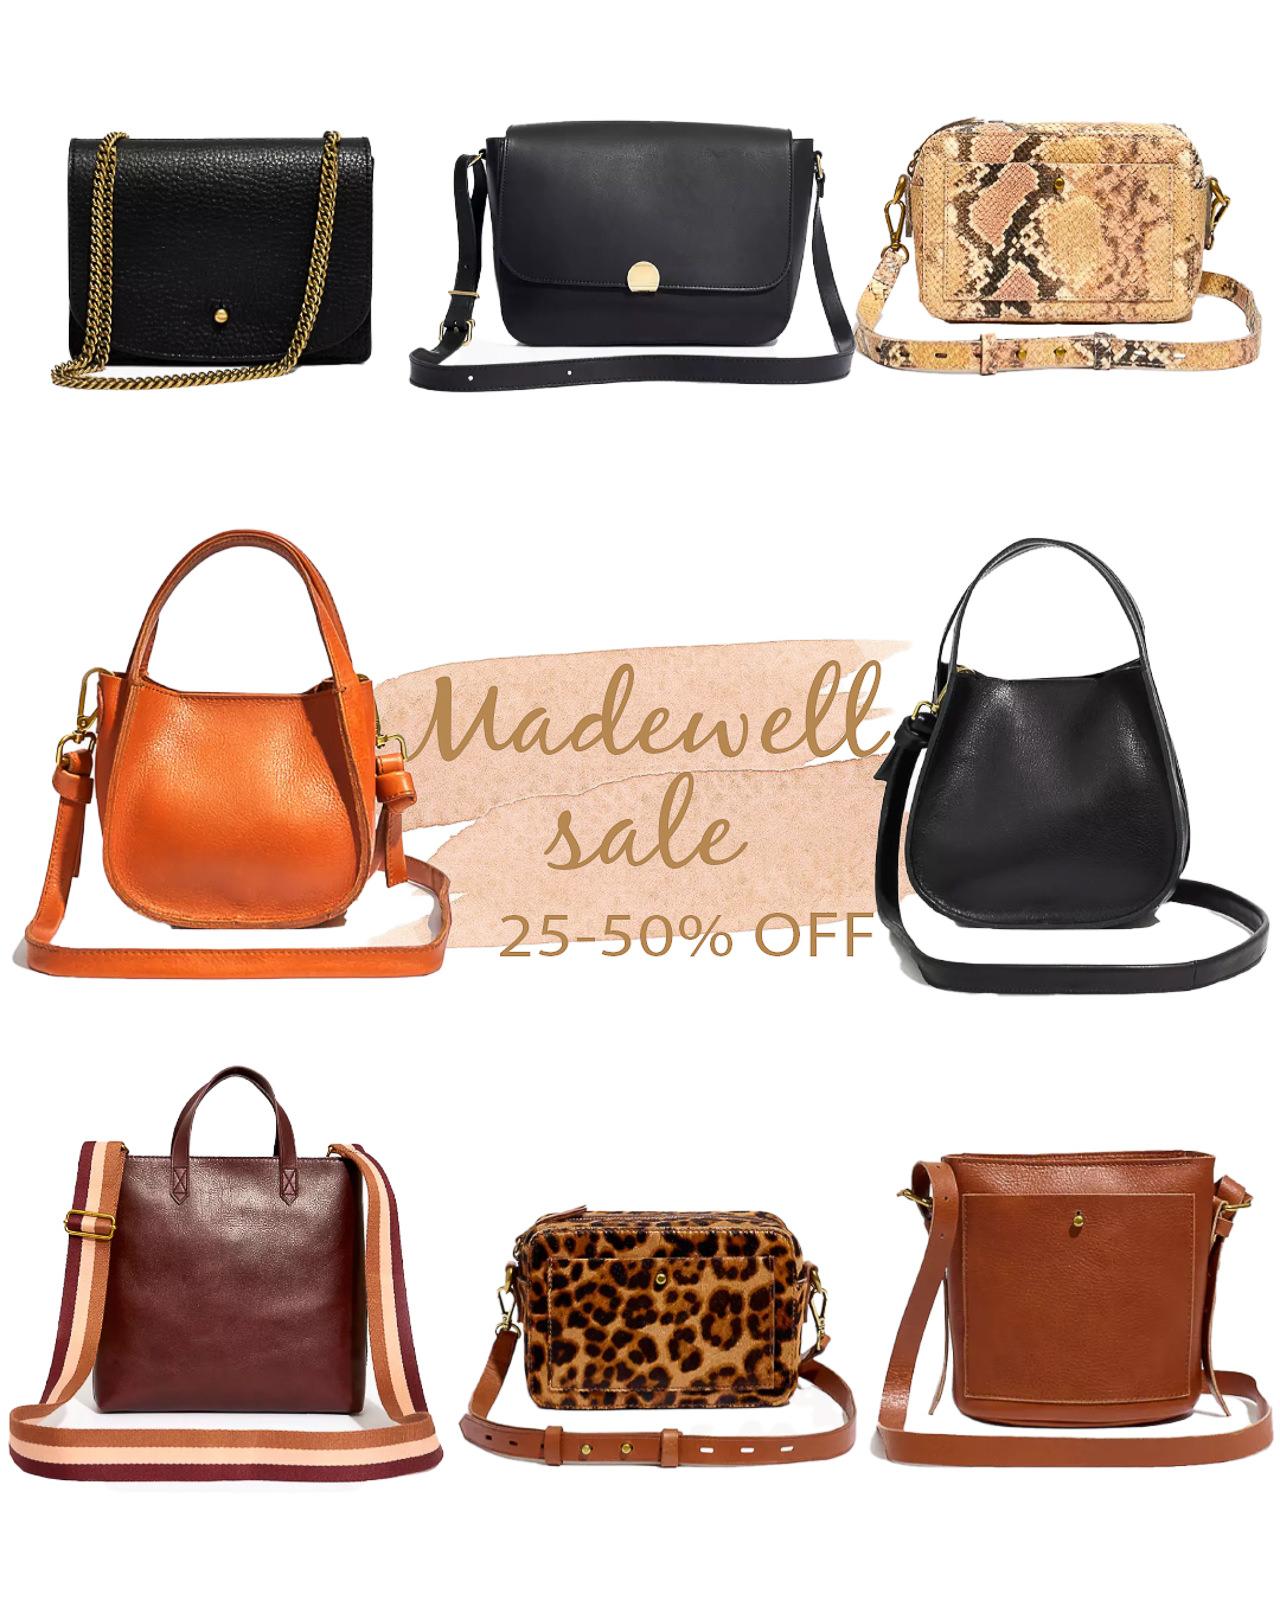 madewell sale bags